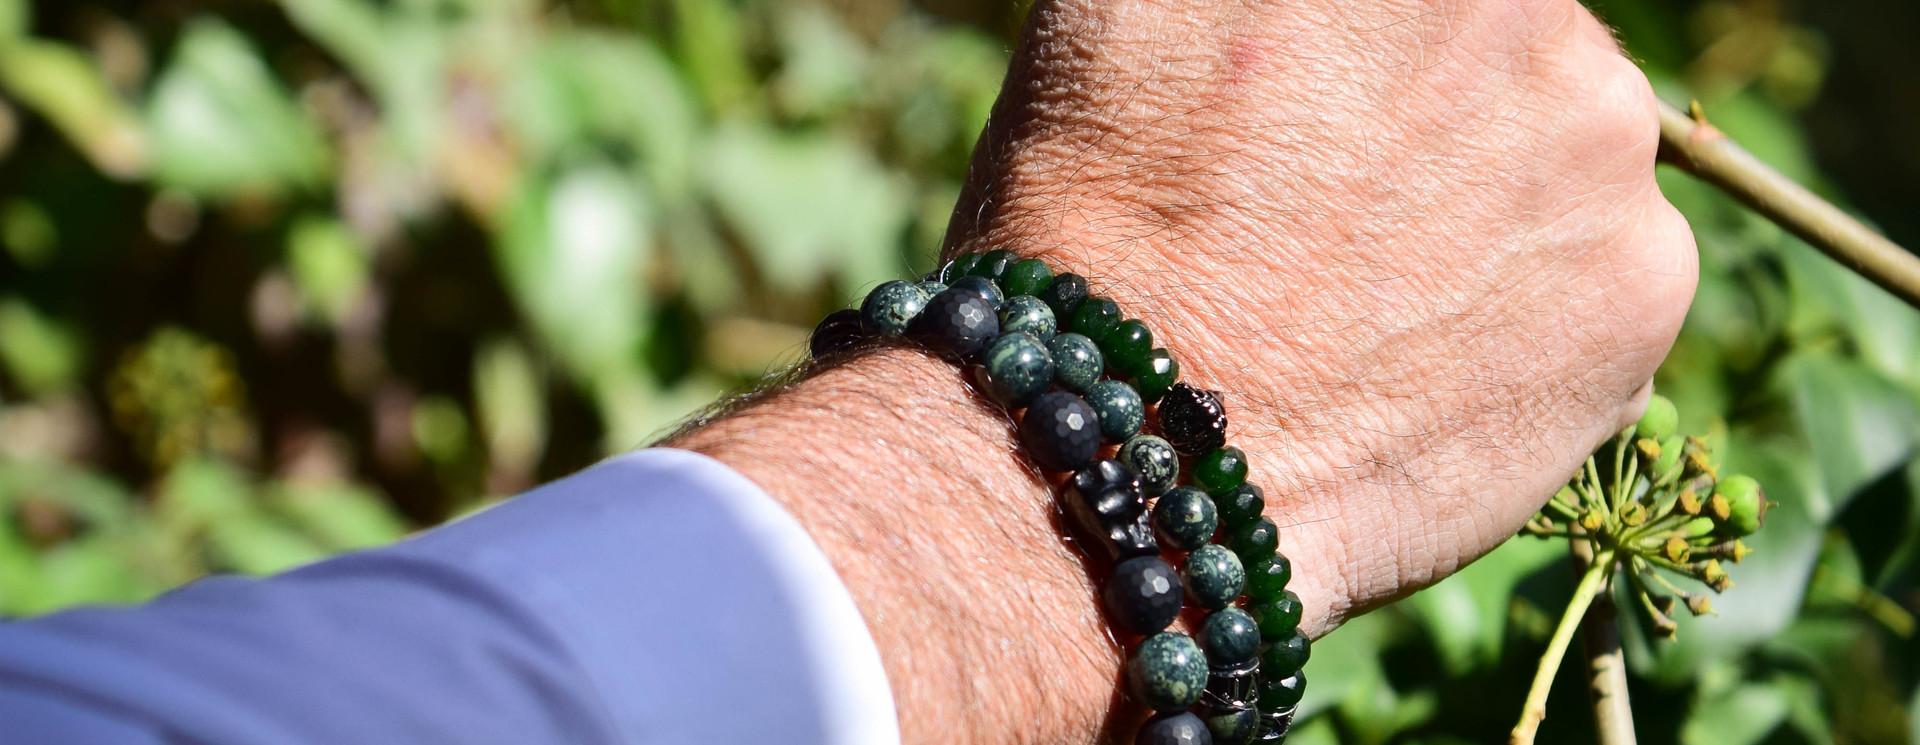 Collectie Heren Armband